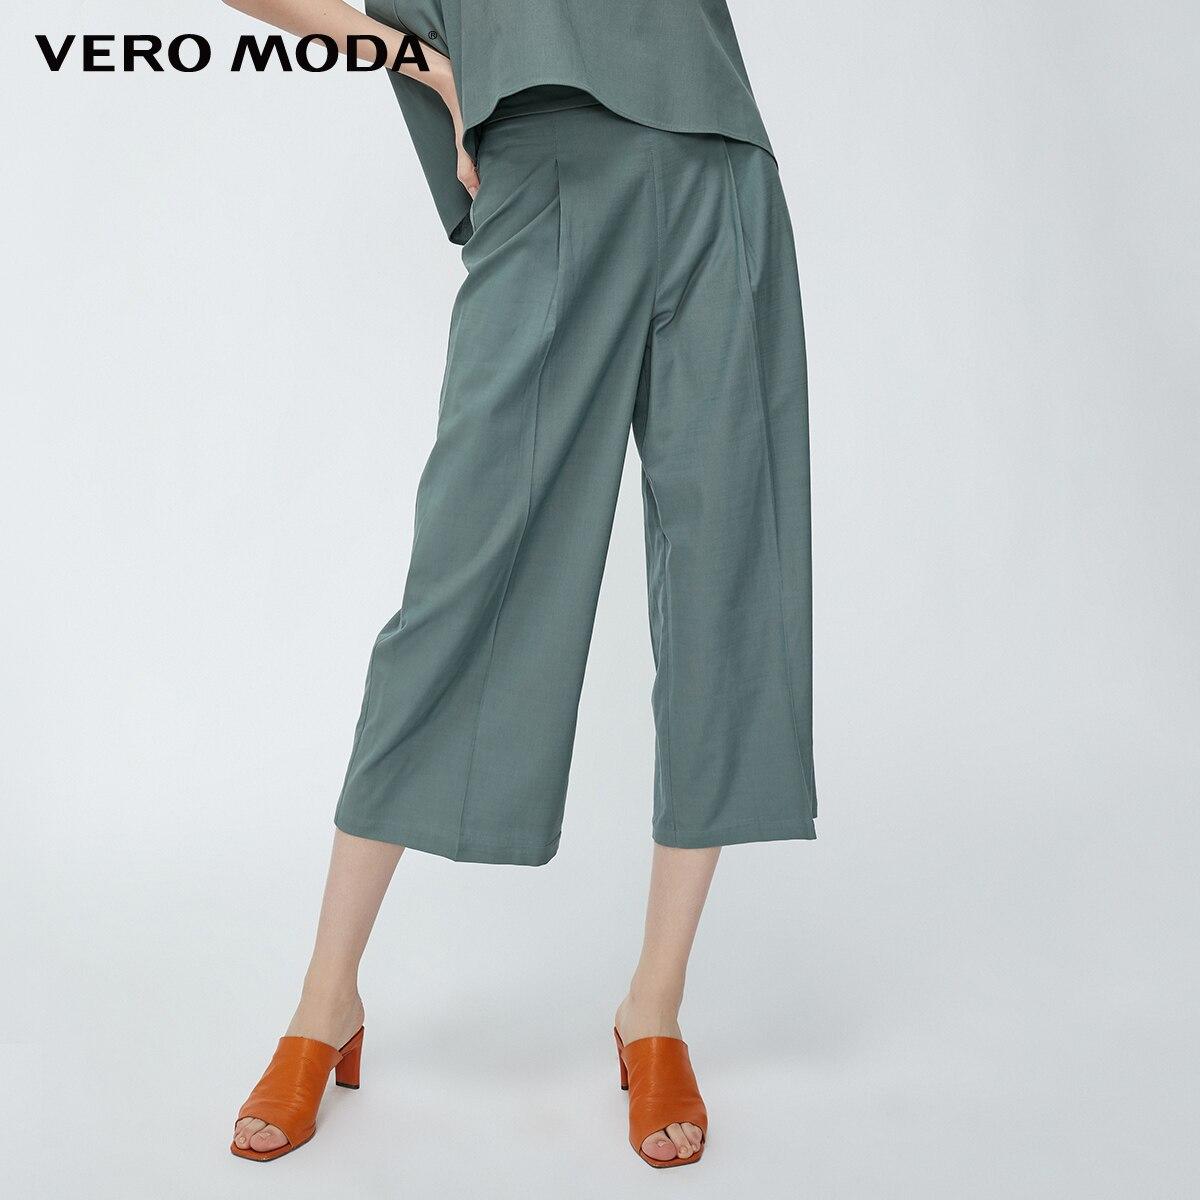 Vero Moda Women's Cotton Linen Mid-rise Capri Pants | 31916J527